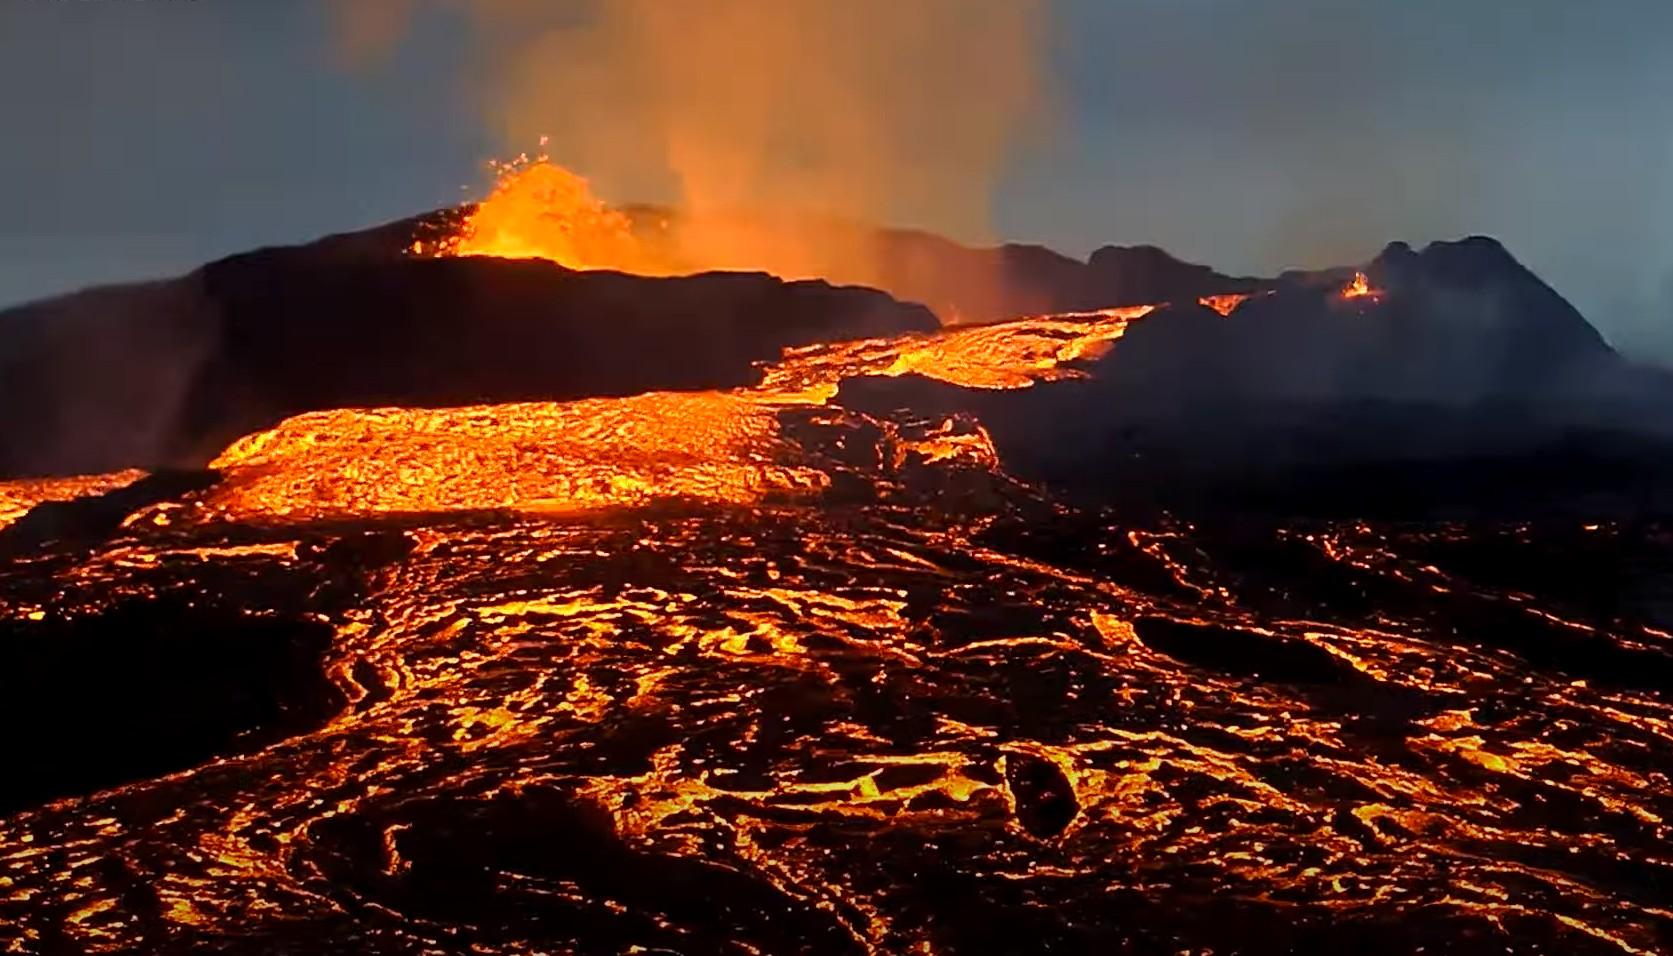 Lava overflow from the main vent last night (image: mbl.is webcam, screenshot via vulkane.net)